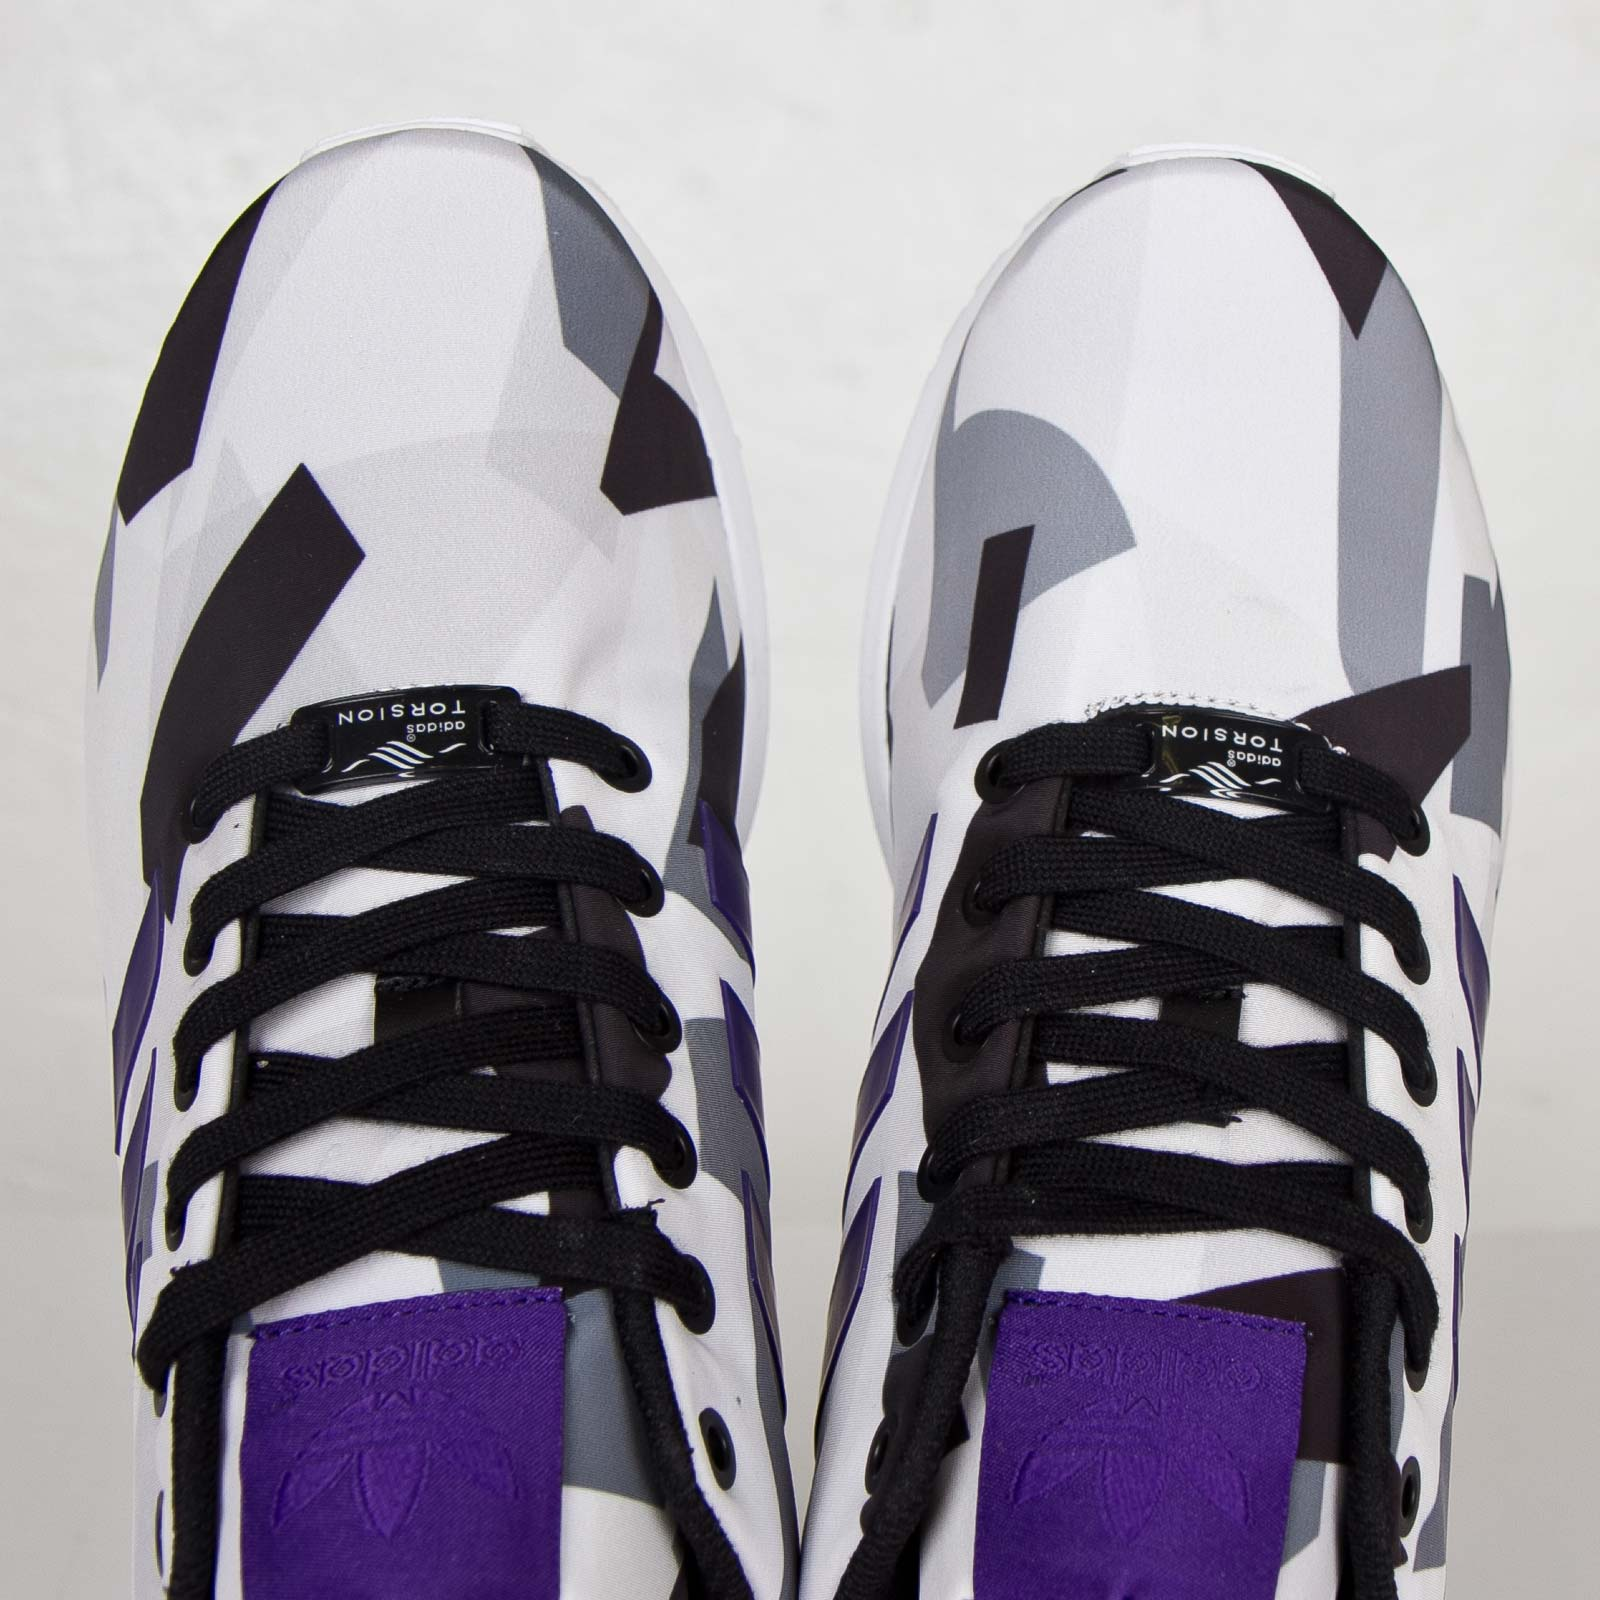 Adidas zx flusso b34517 scarpe da ginnasticanstuff scarpe & streetwear